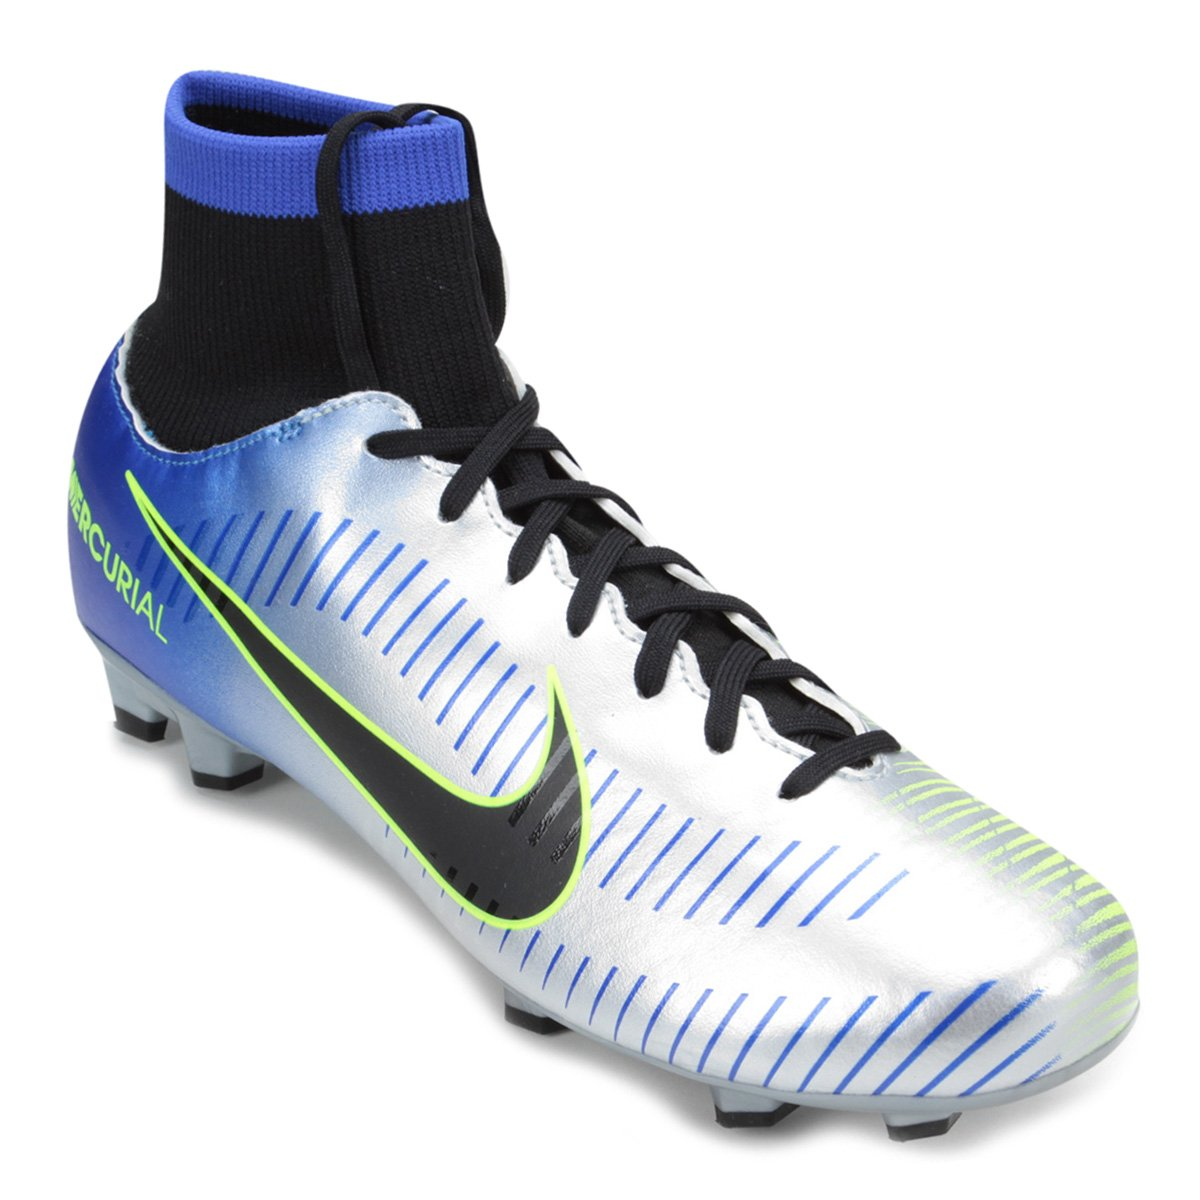 bae08add18 Chuteira Campo Nike Mercurial Victory 6 DF Neymar Jr FG - Azul e ...